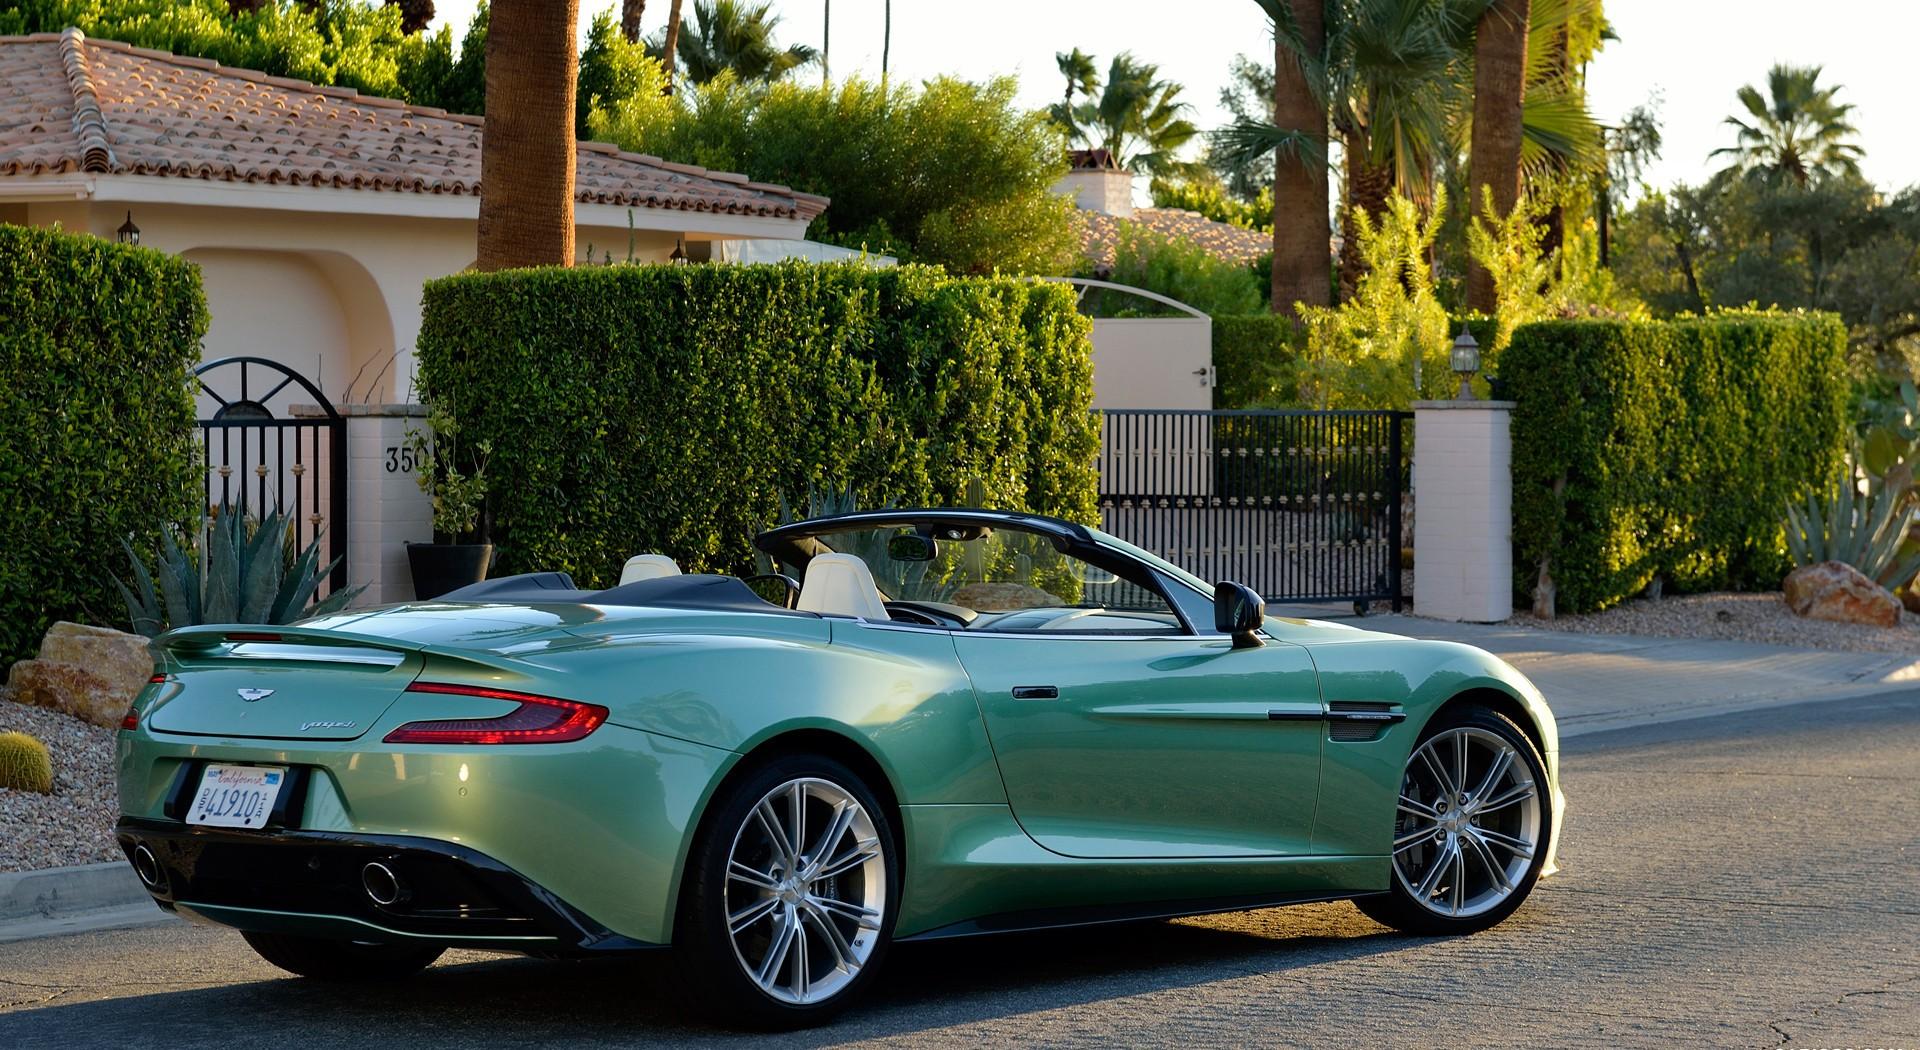 Aston Martin Vanquish Wallpapers Green Hd Hd Desktop Wallpapers 4k Hd